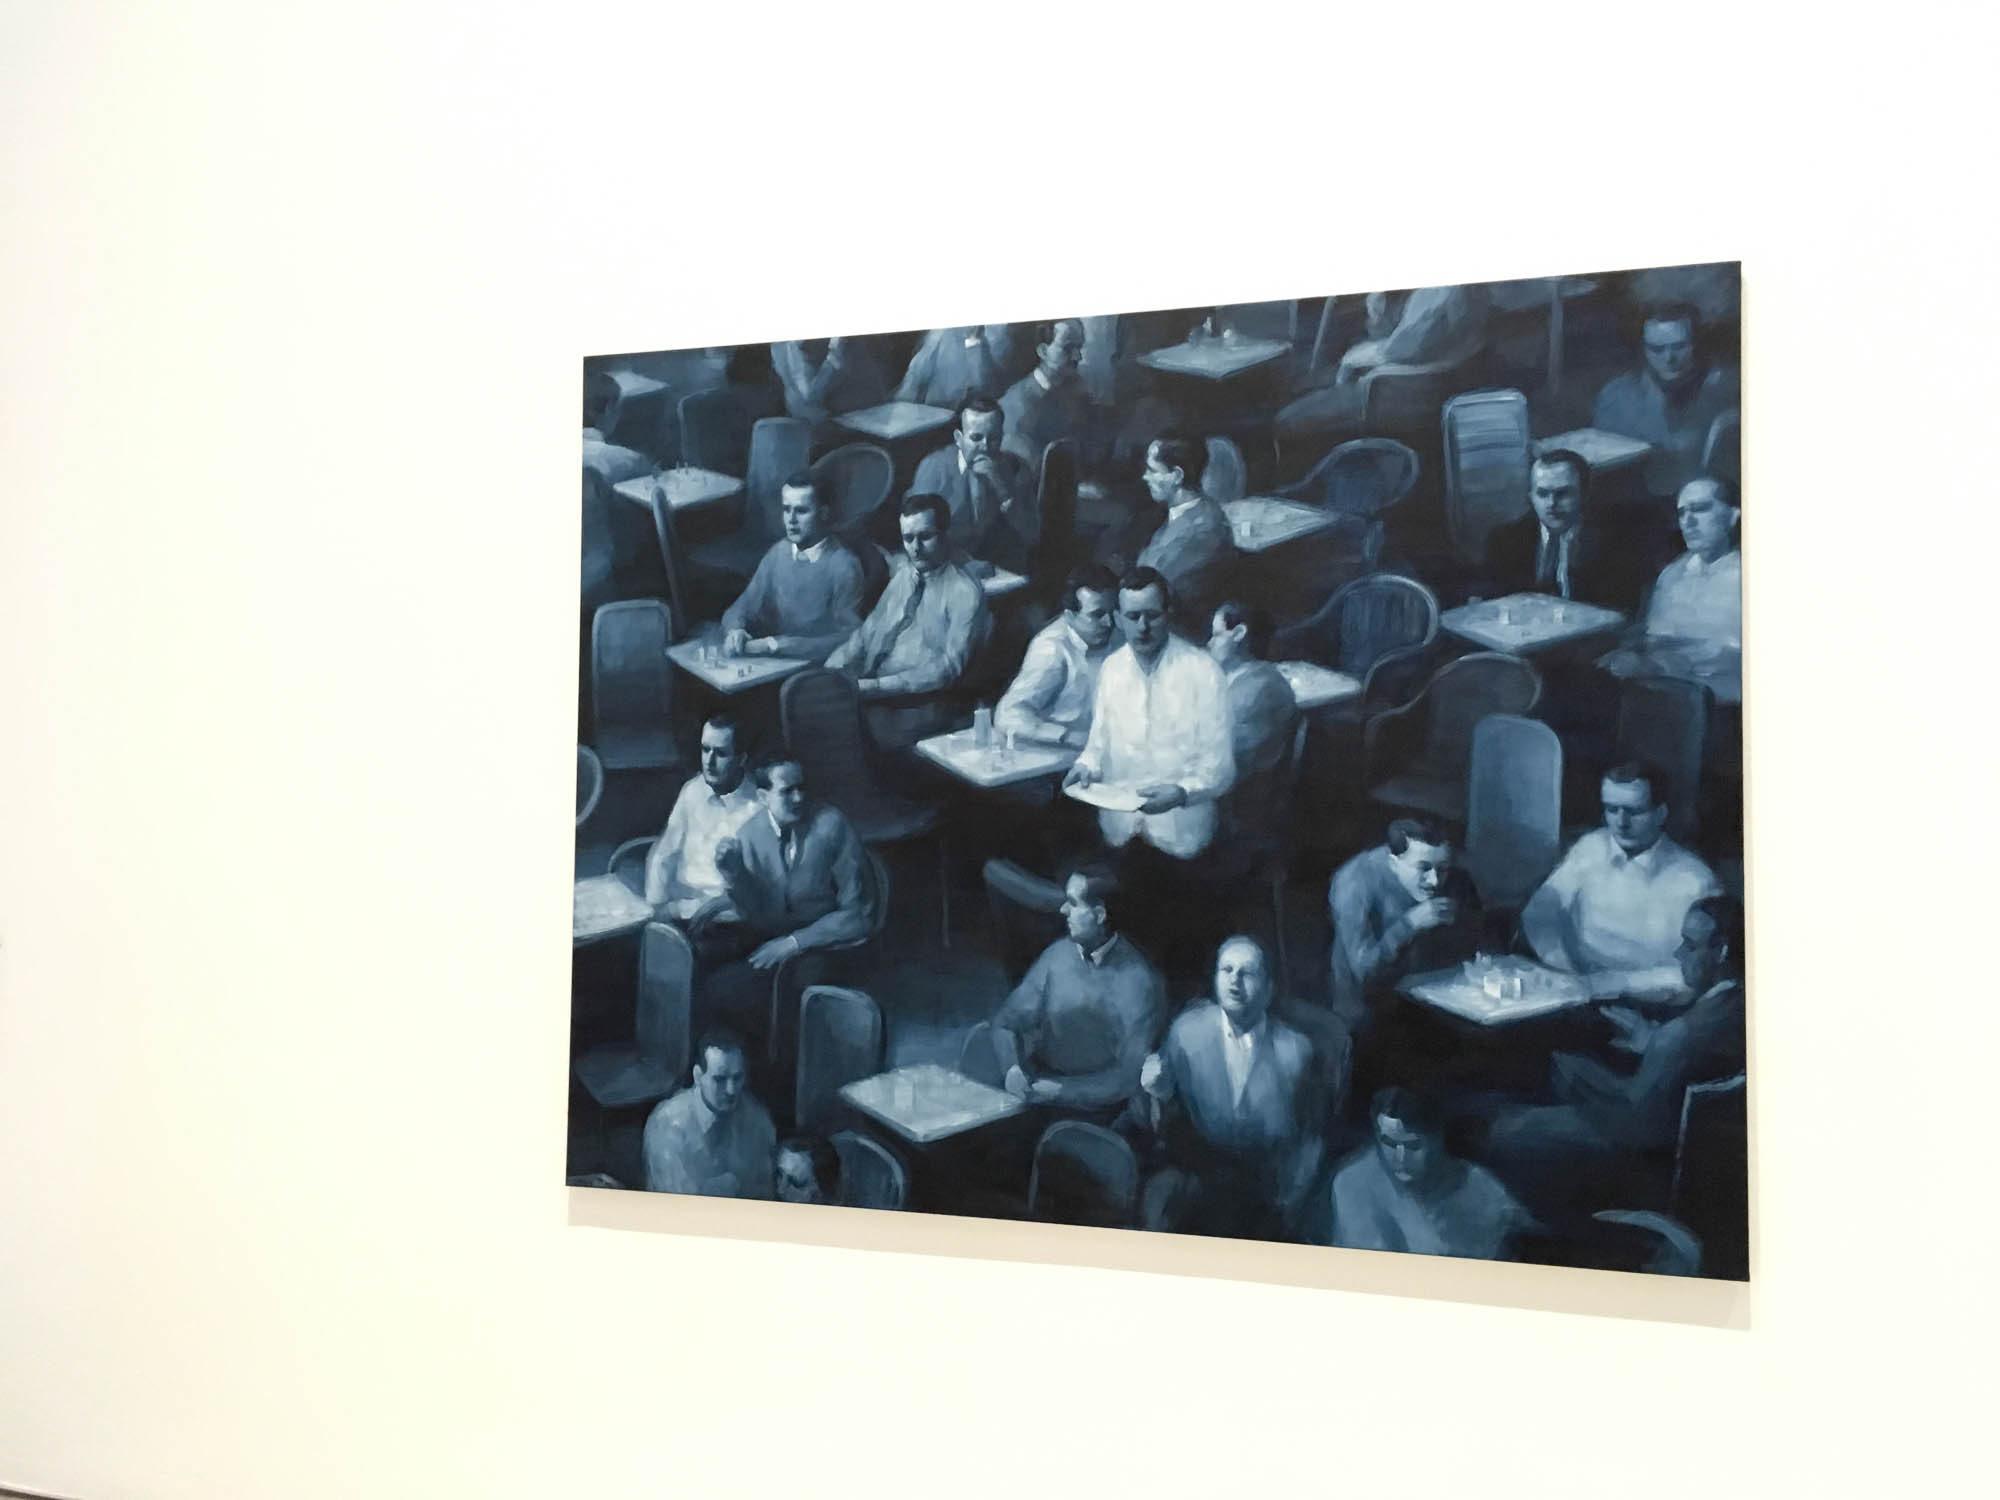 Les clones aux cols blancs de Peter Martensen